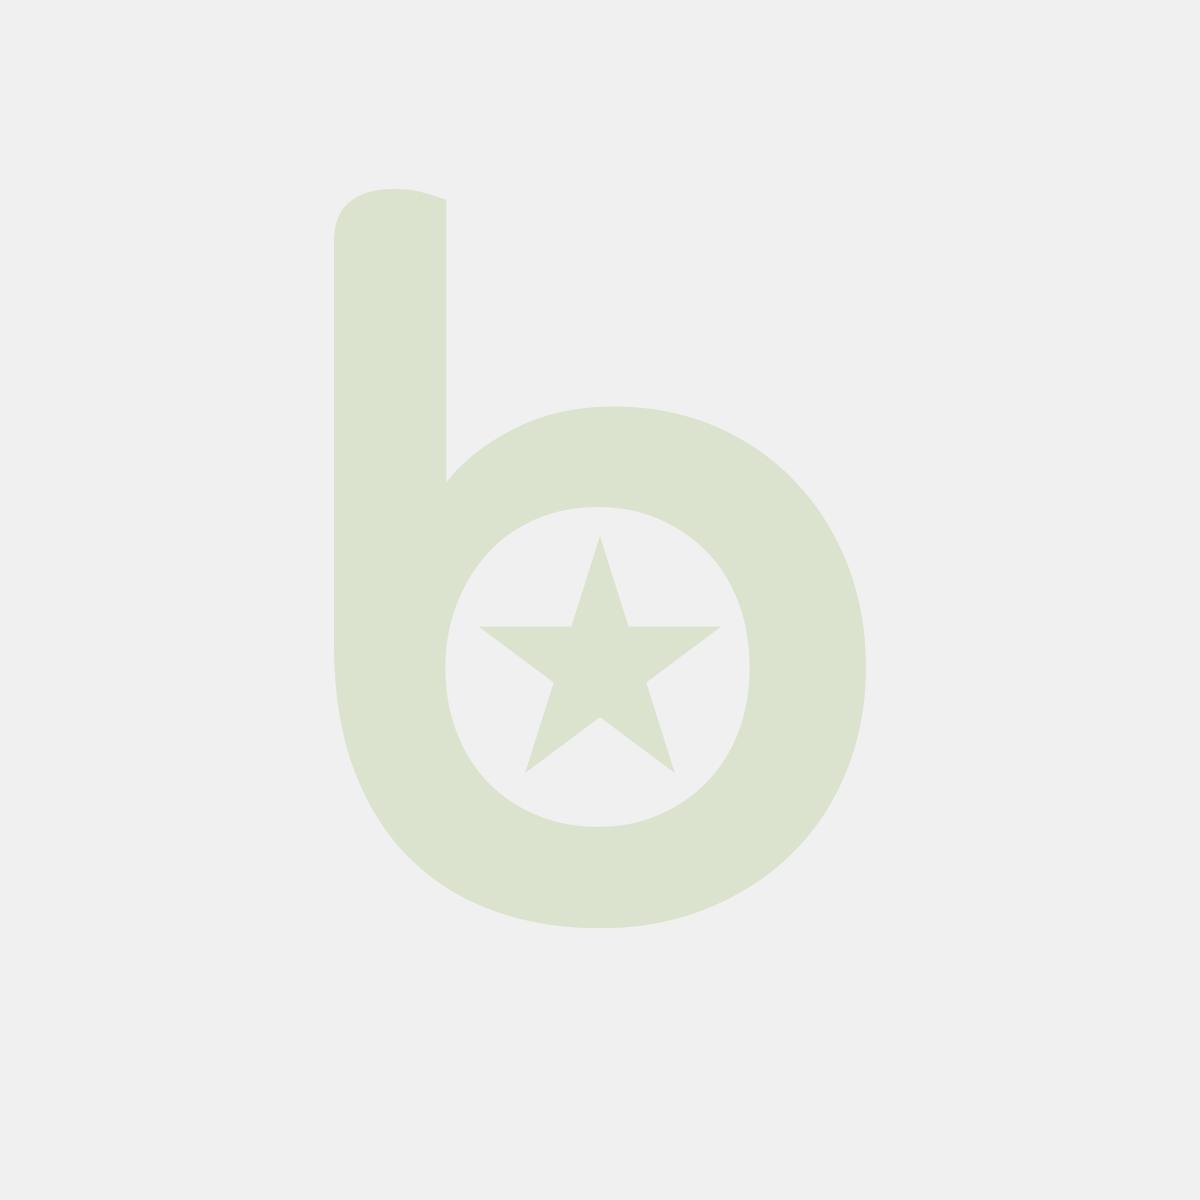 Pucharek FINGERFOOD czarna, PS, 25 szt. w opakowaniu